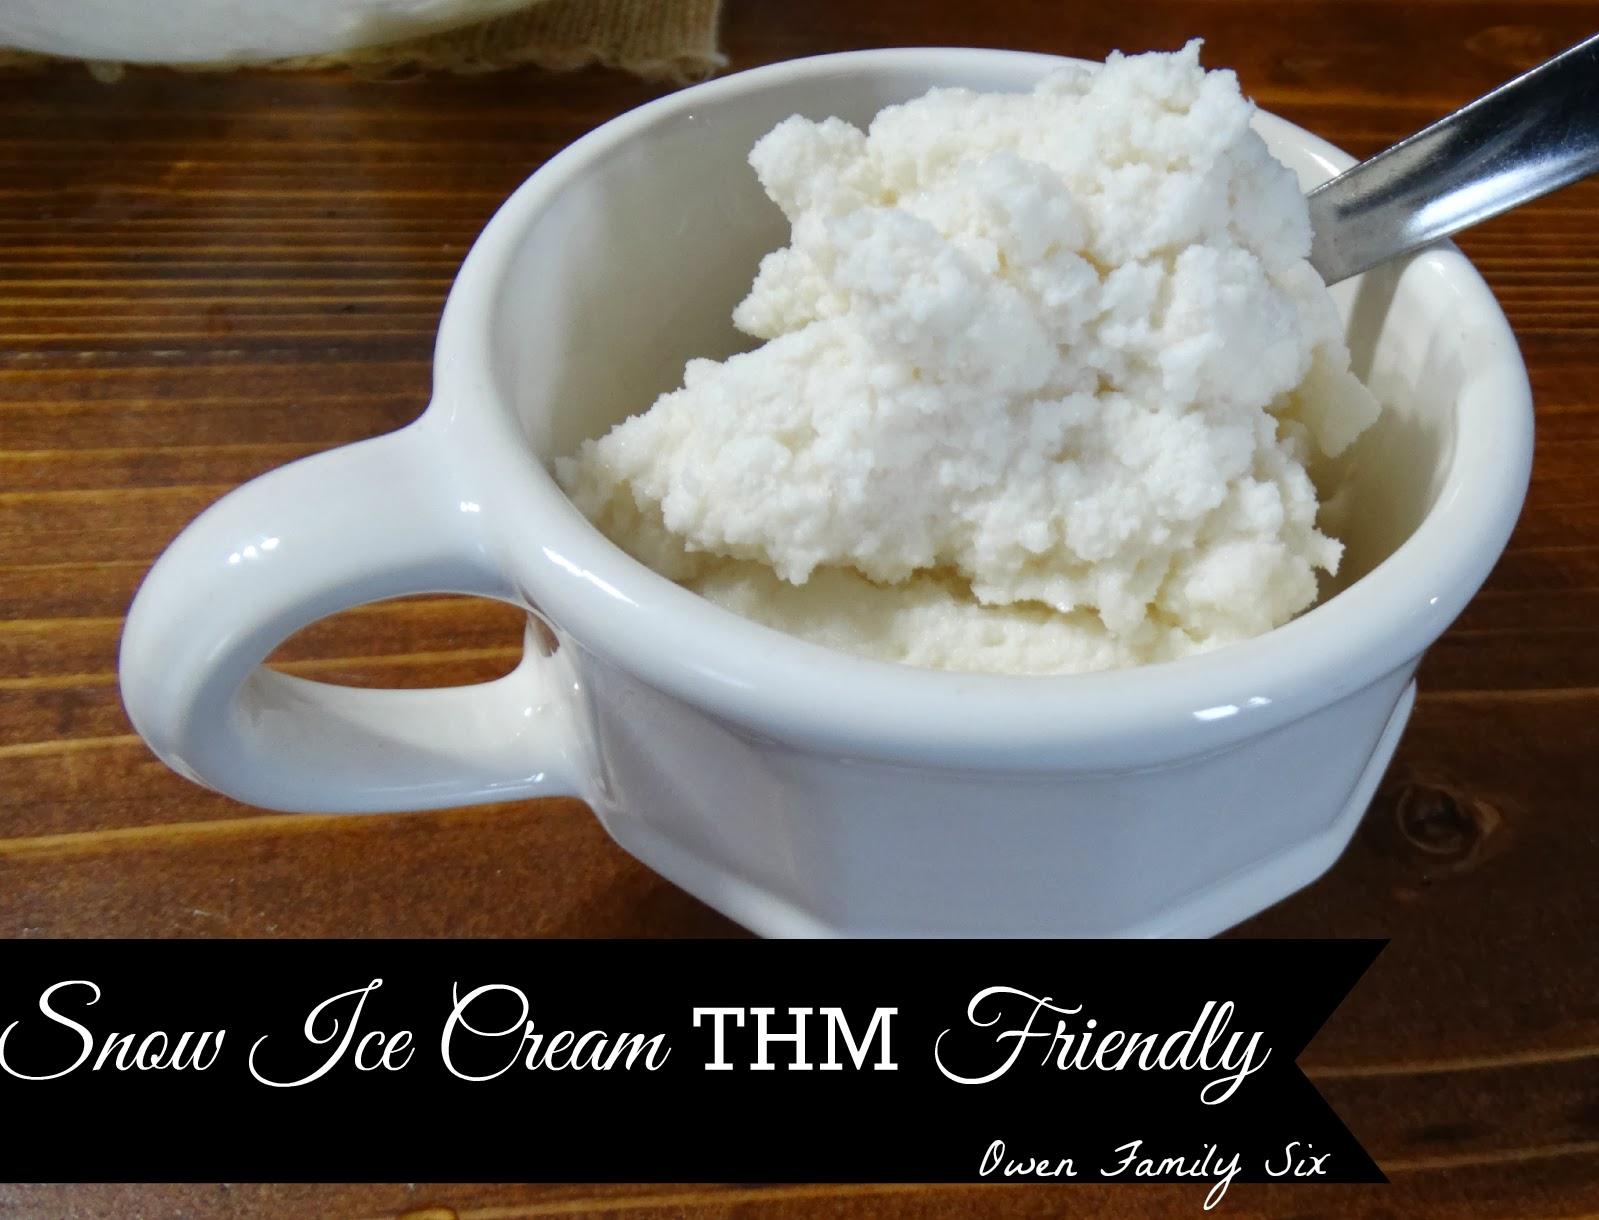 Trim Healthy Tuesdays